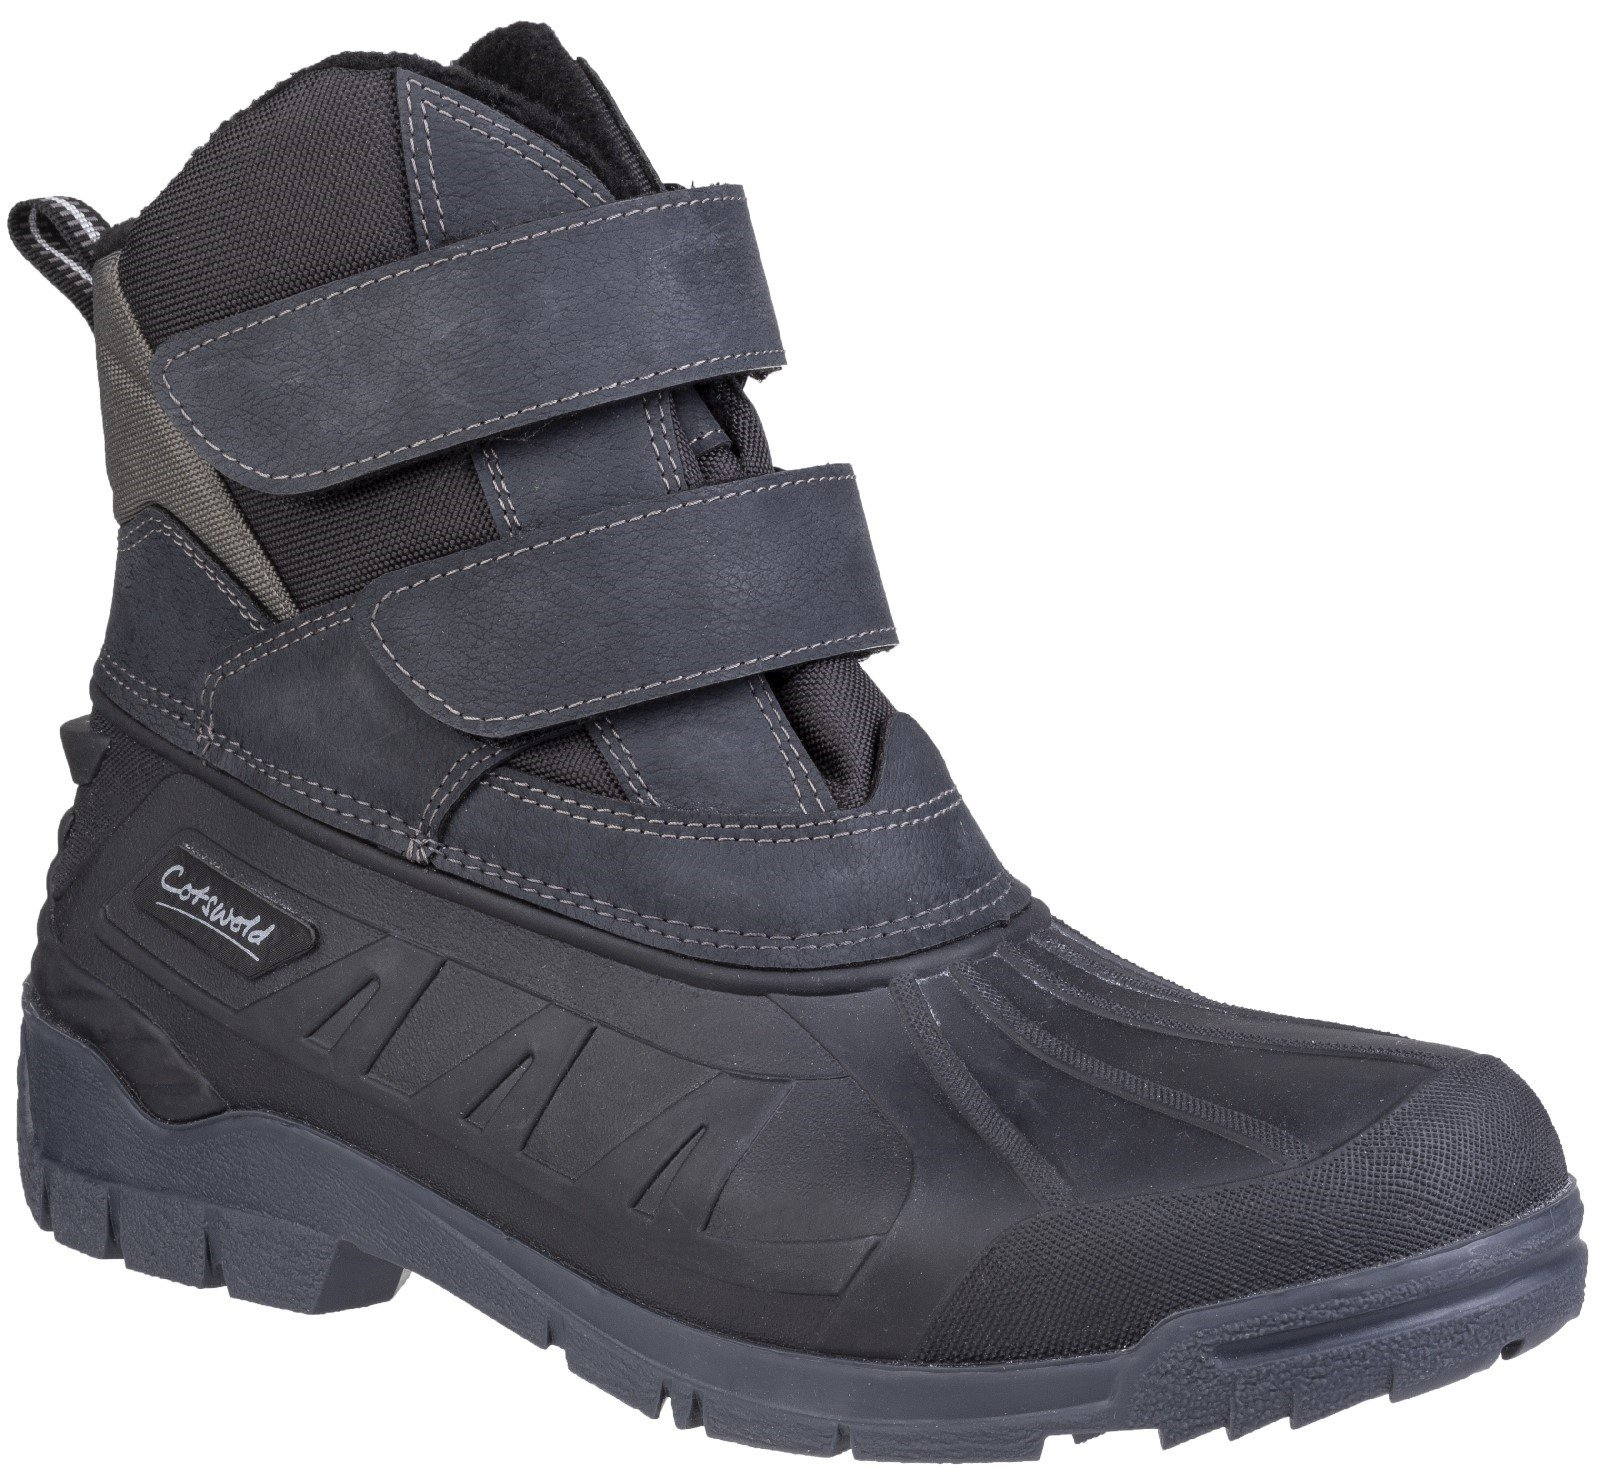 Cotswold Unisex Kempsford Wellington Boot Black 27048 - Black 3